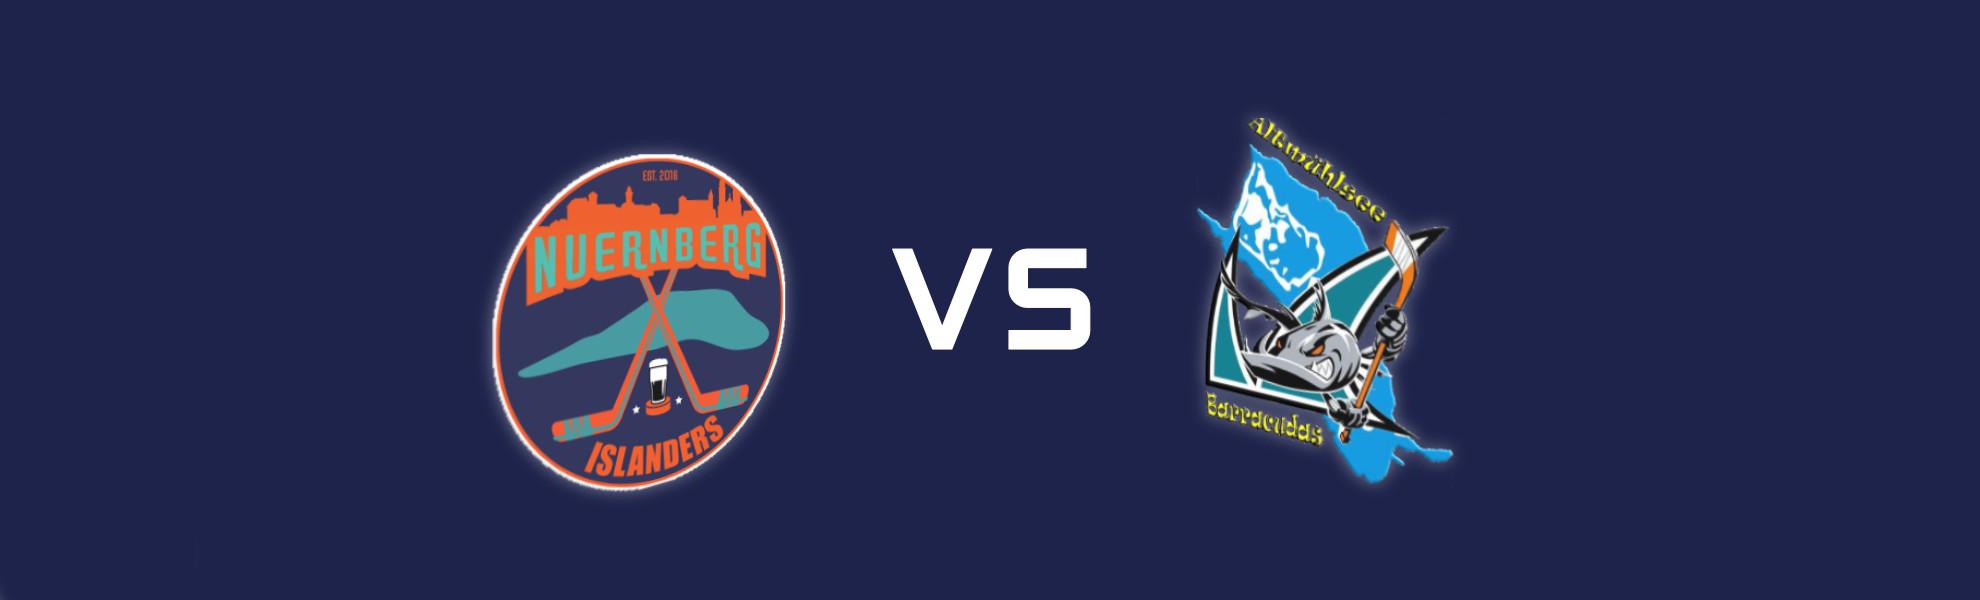 Spieltag - Nürnberg Islanders vs Altmühlsee Barracudas